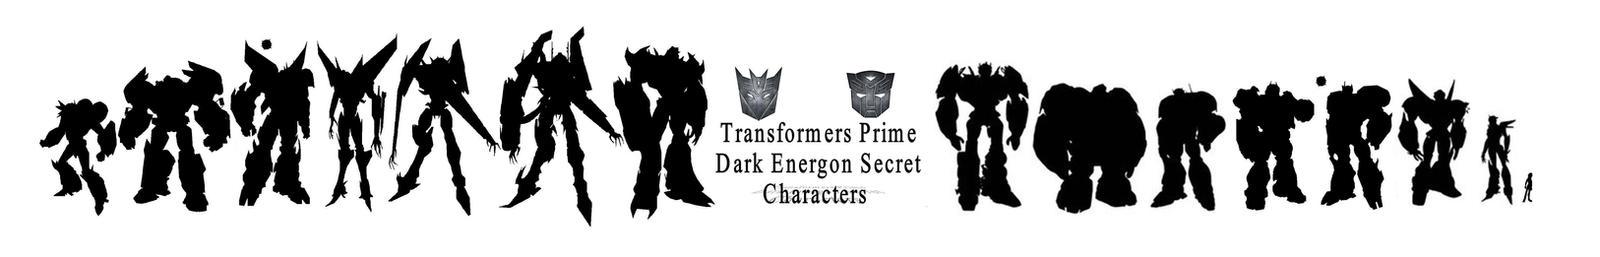 Transformers Movies Ch...